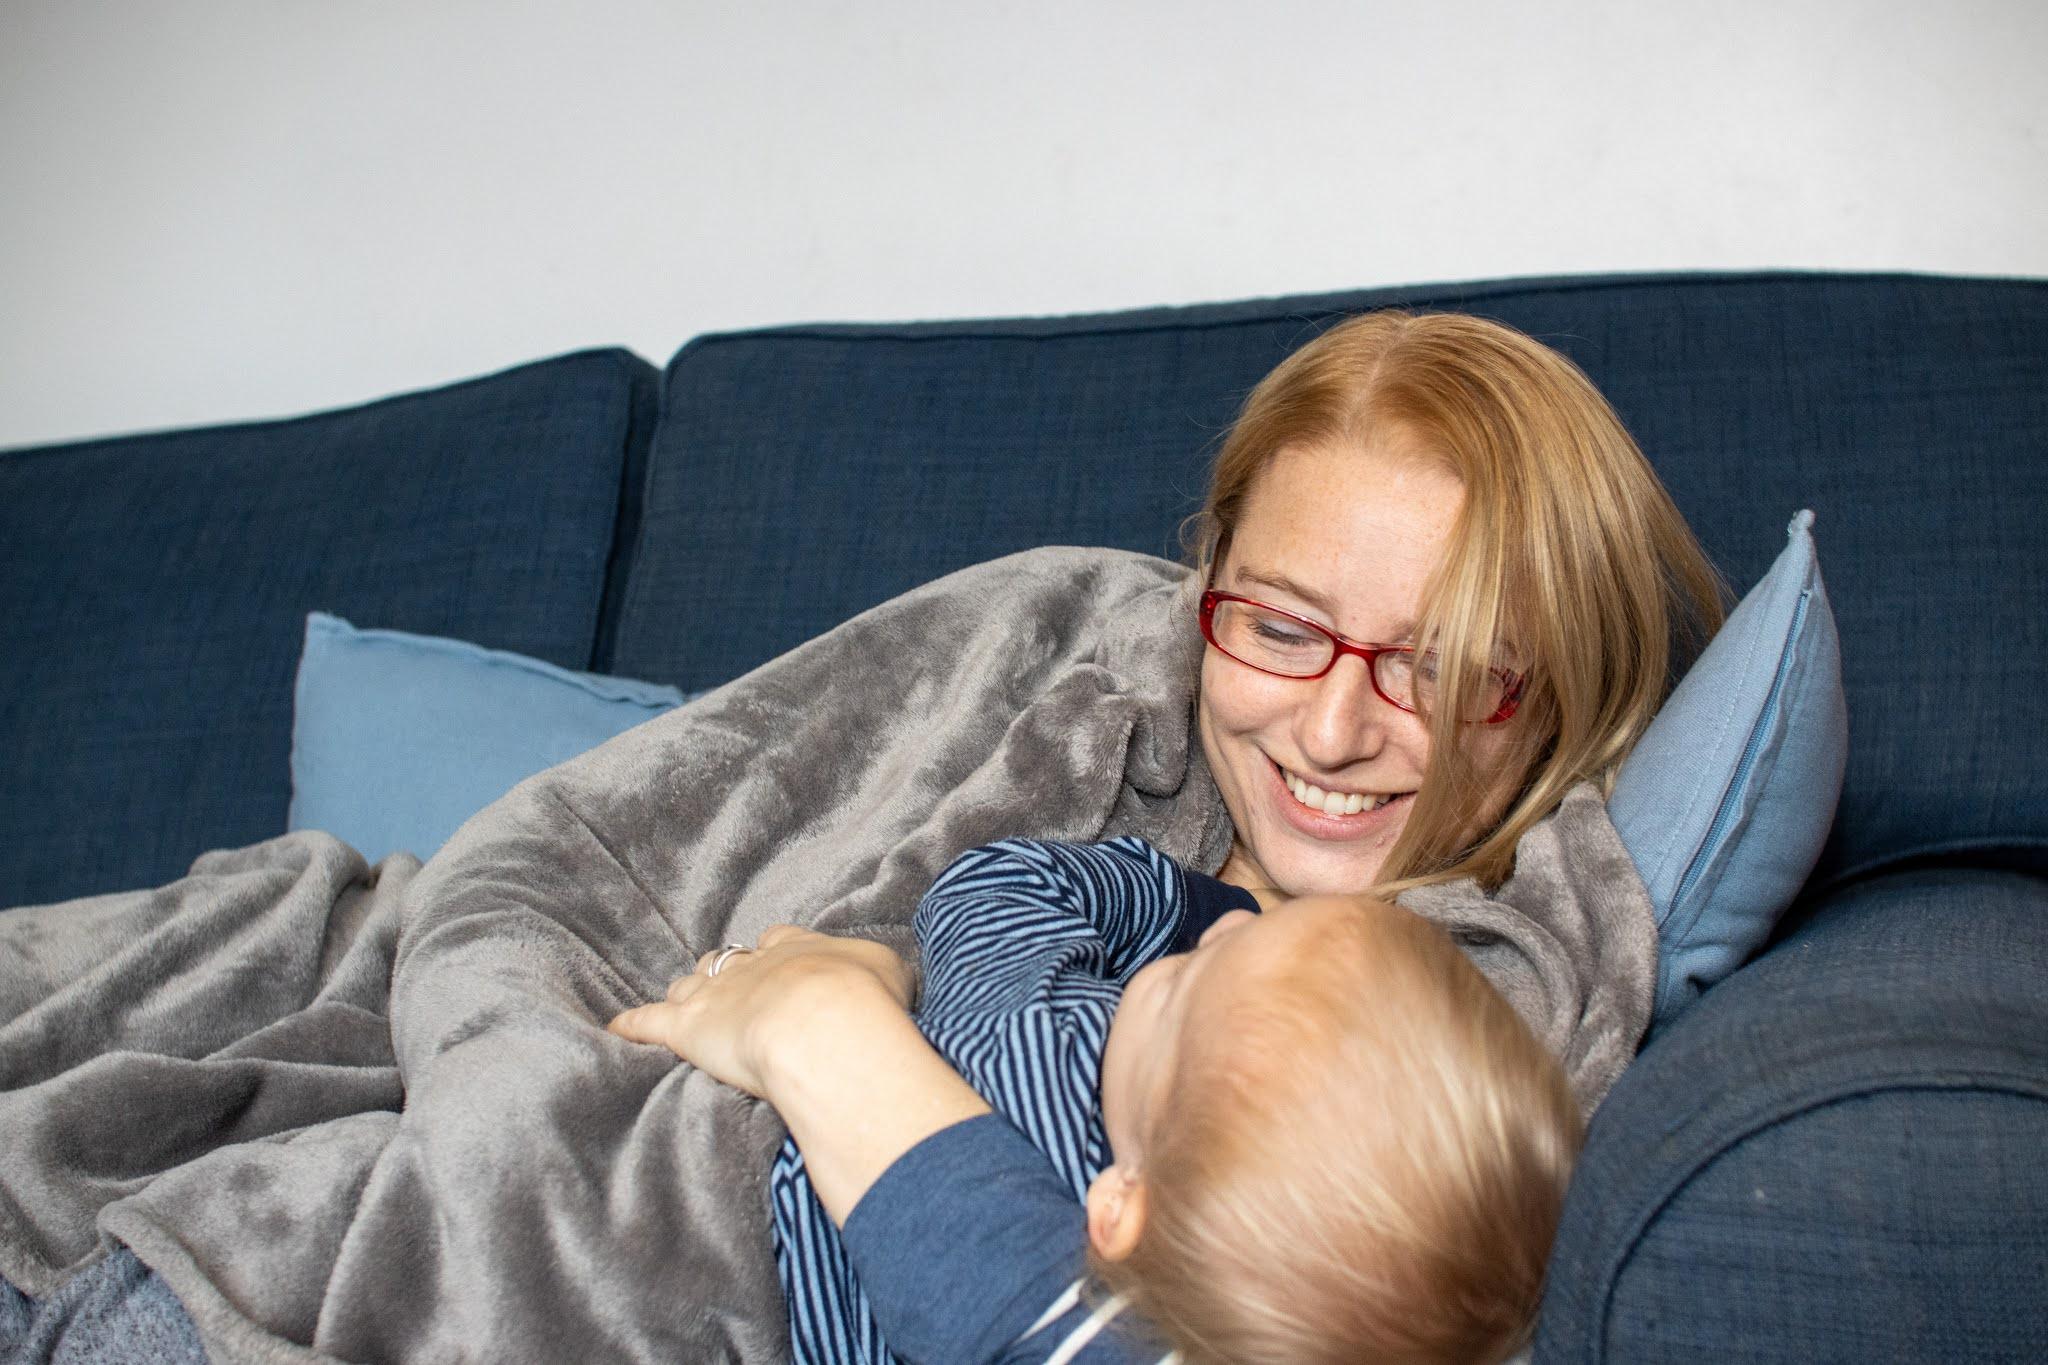 Me on the sofa cuddling my son